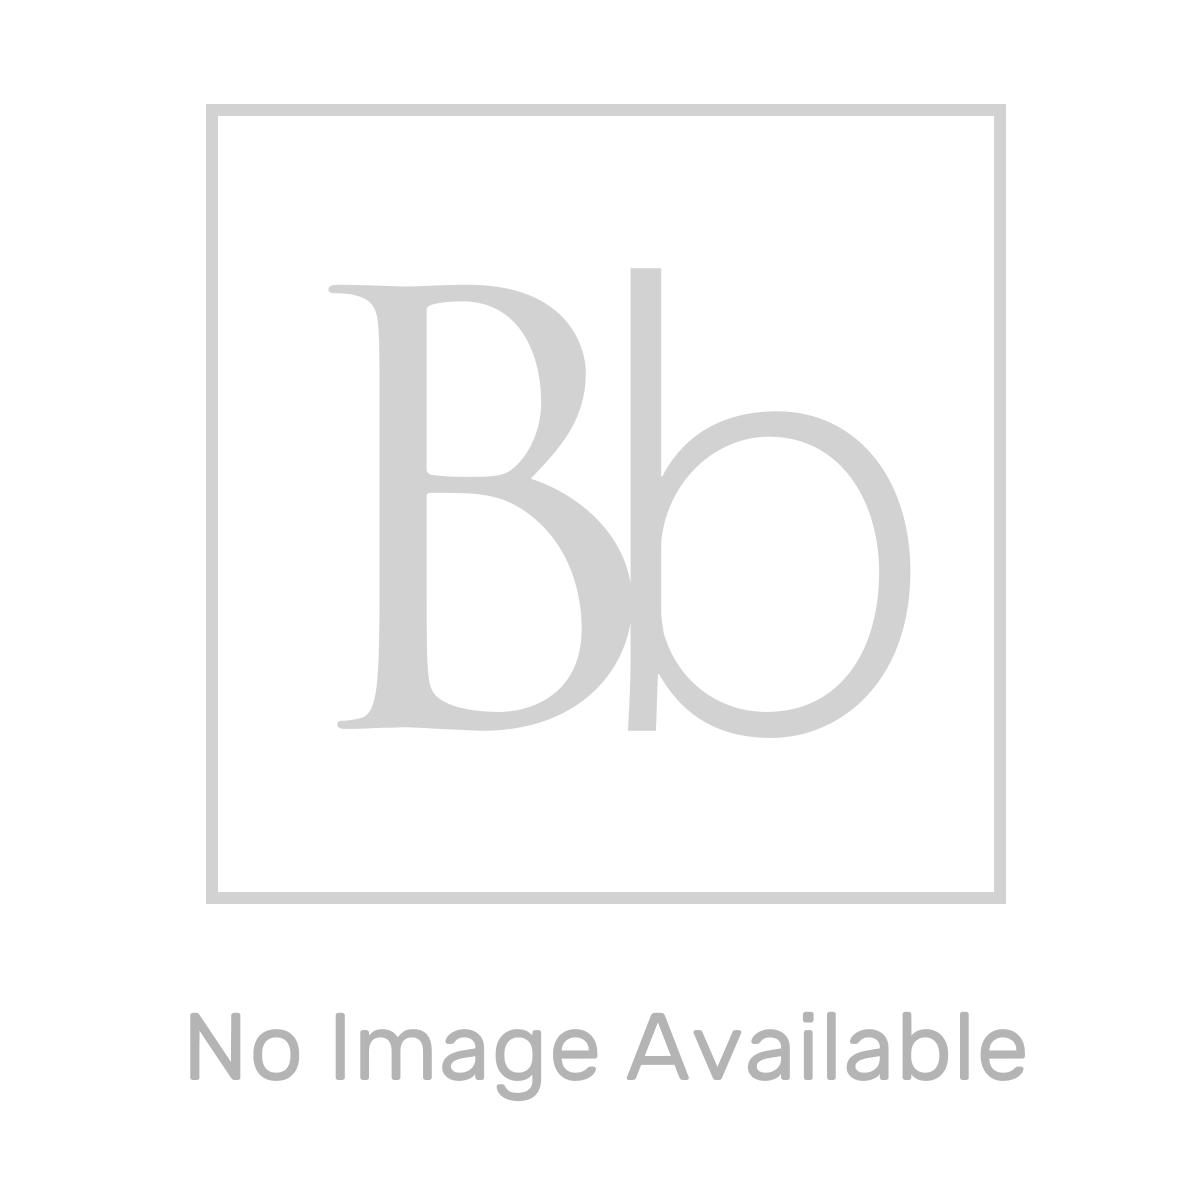 Stuart Turner 46586 Diver 45 Submersible Pump